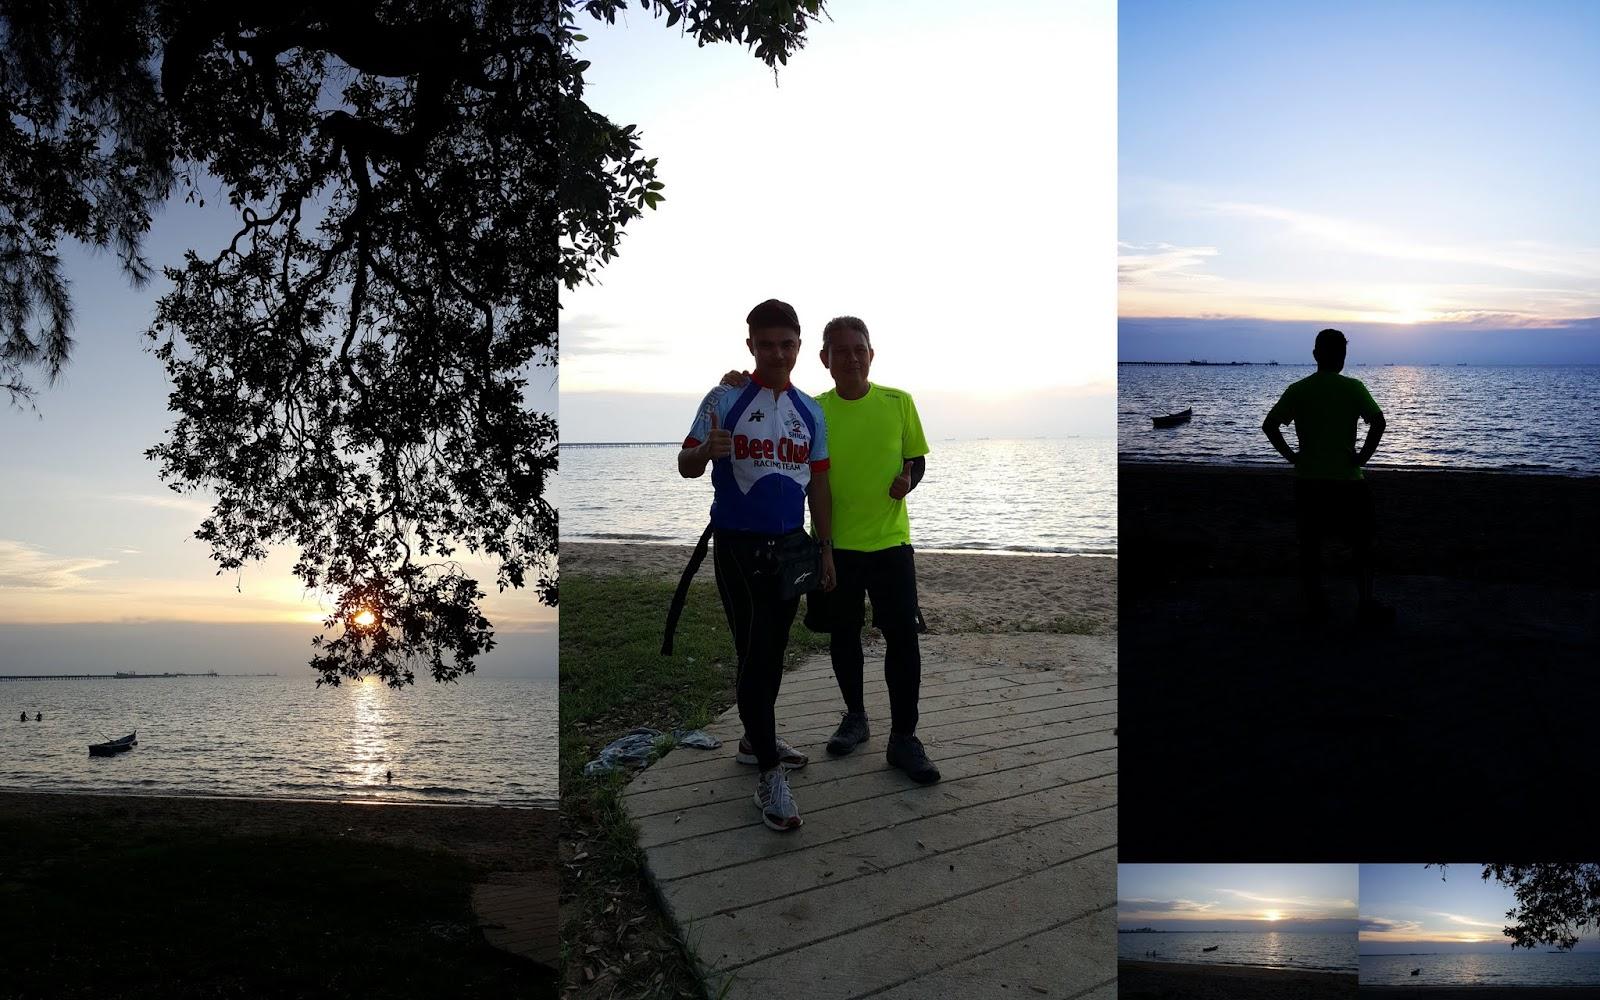 Pantai Tanjung Gemok